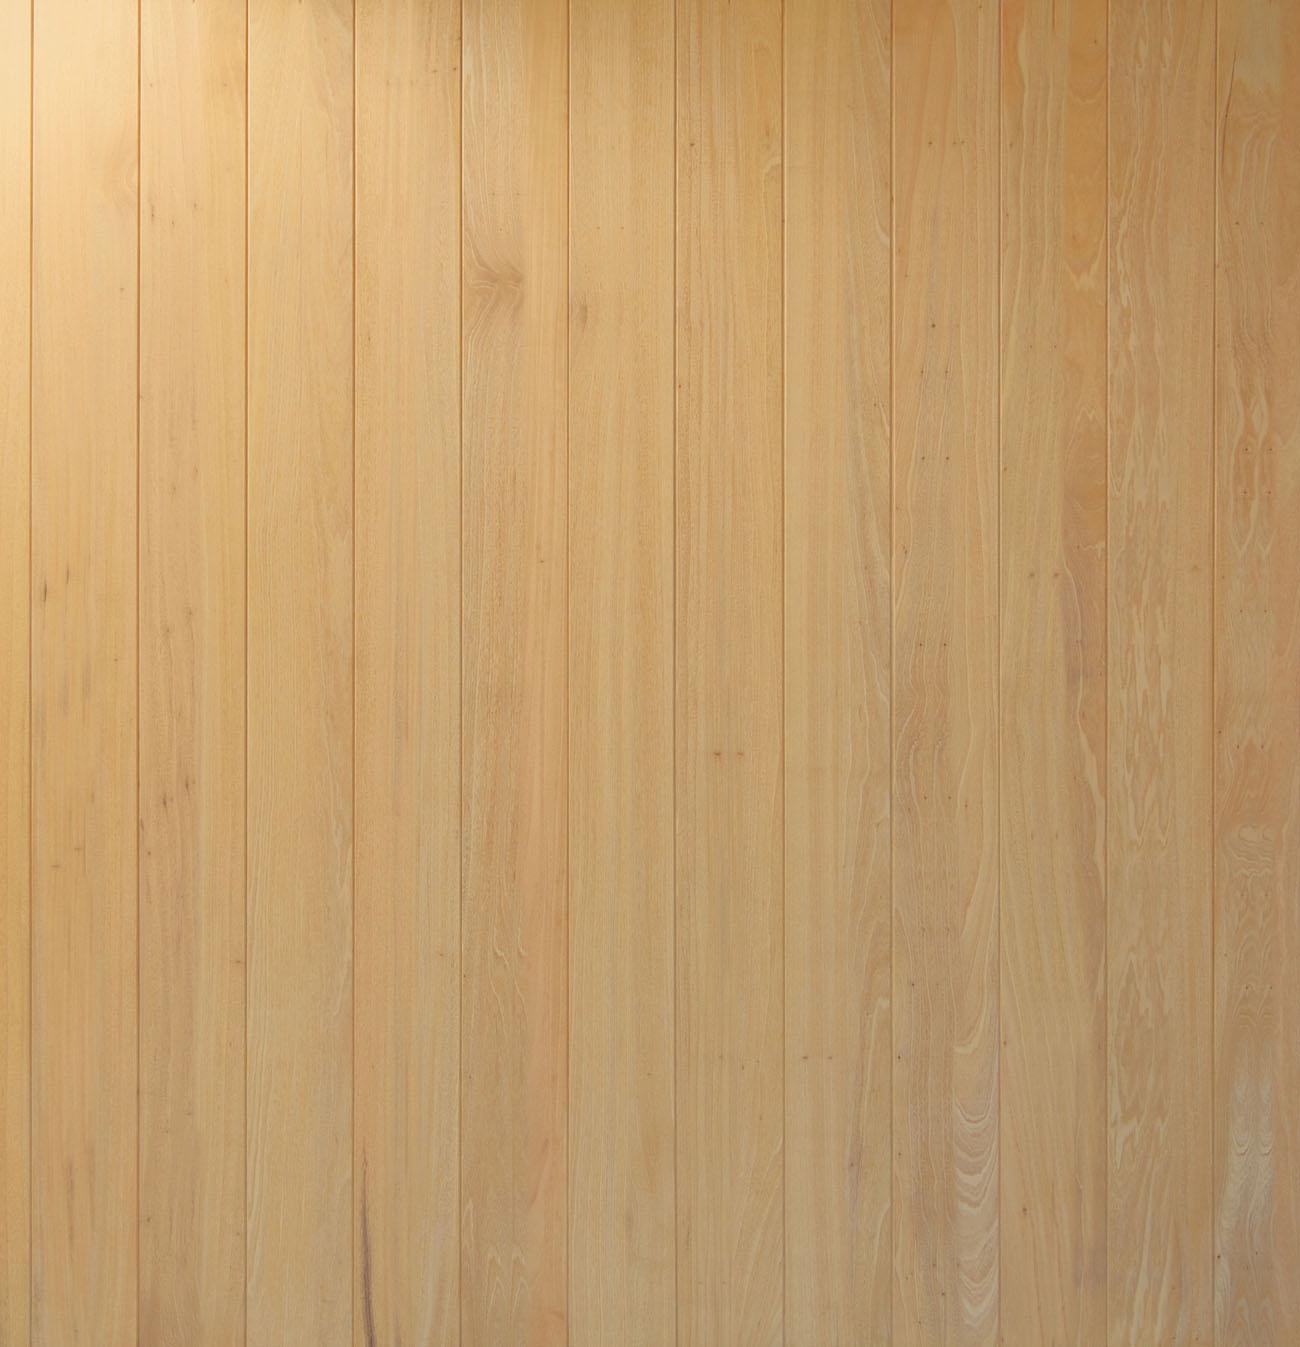 Thames Warwick Panel